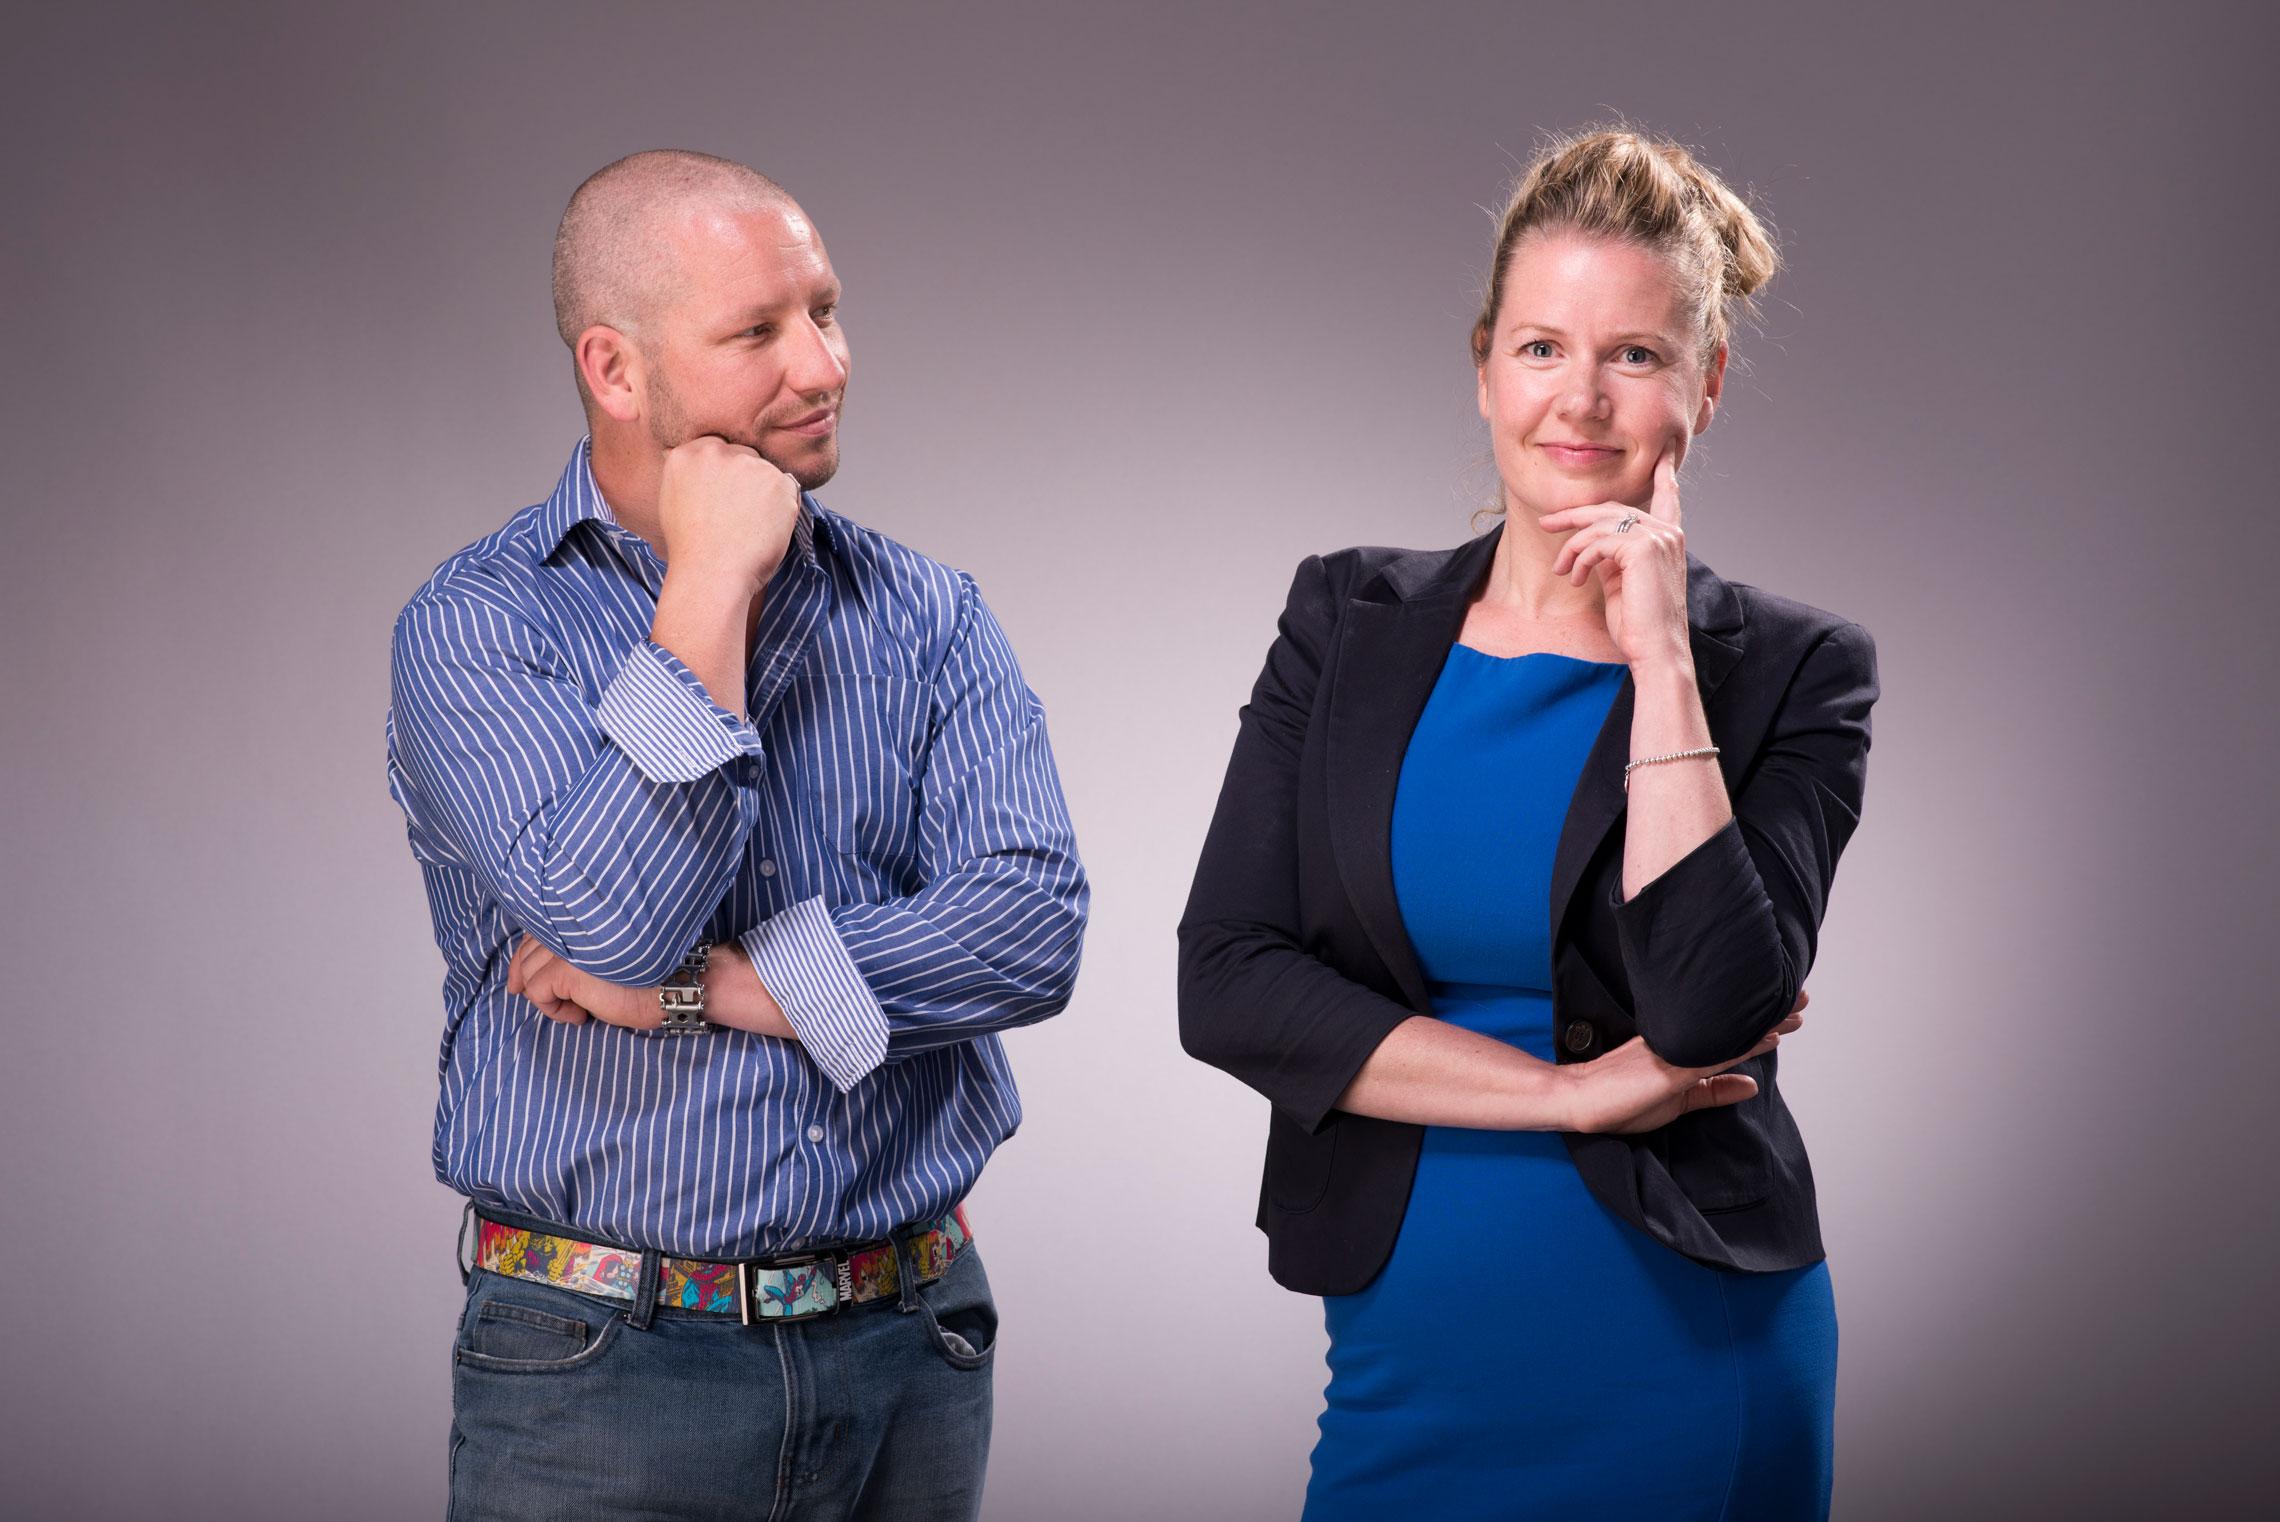 Personal development - Leonie and Sam